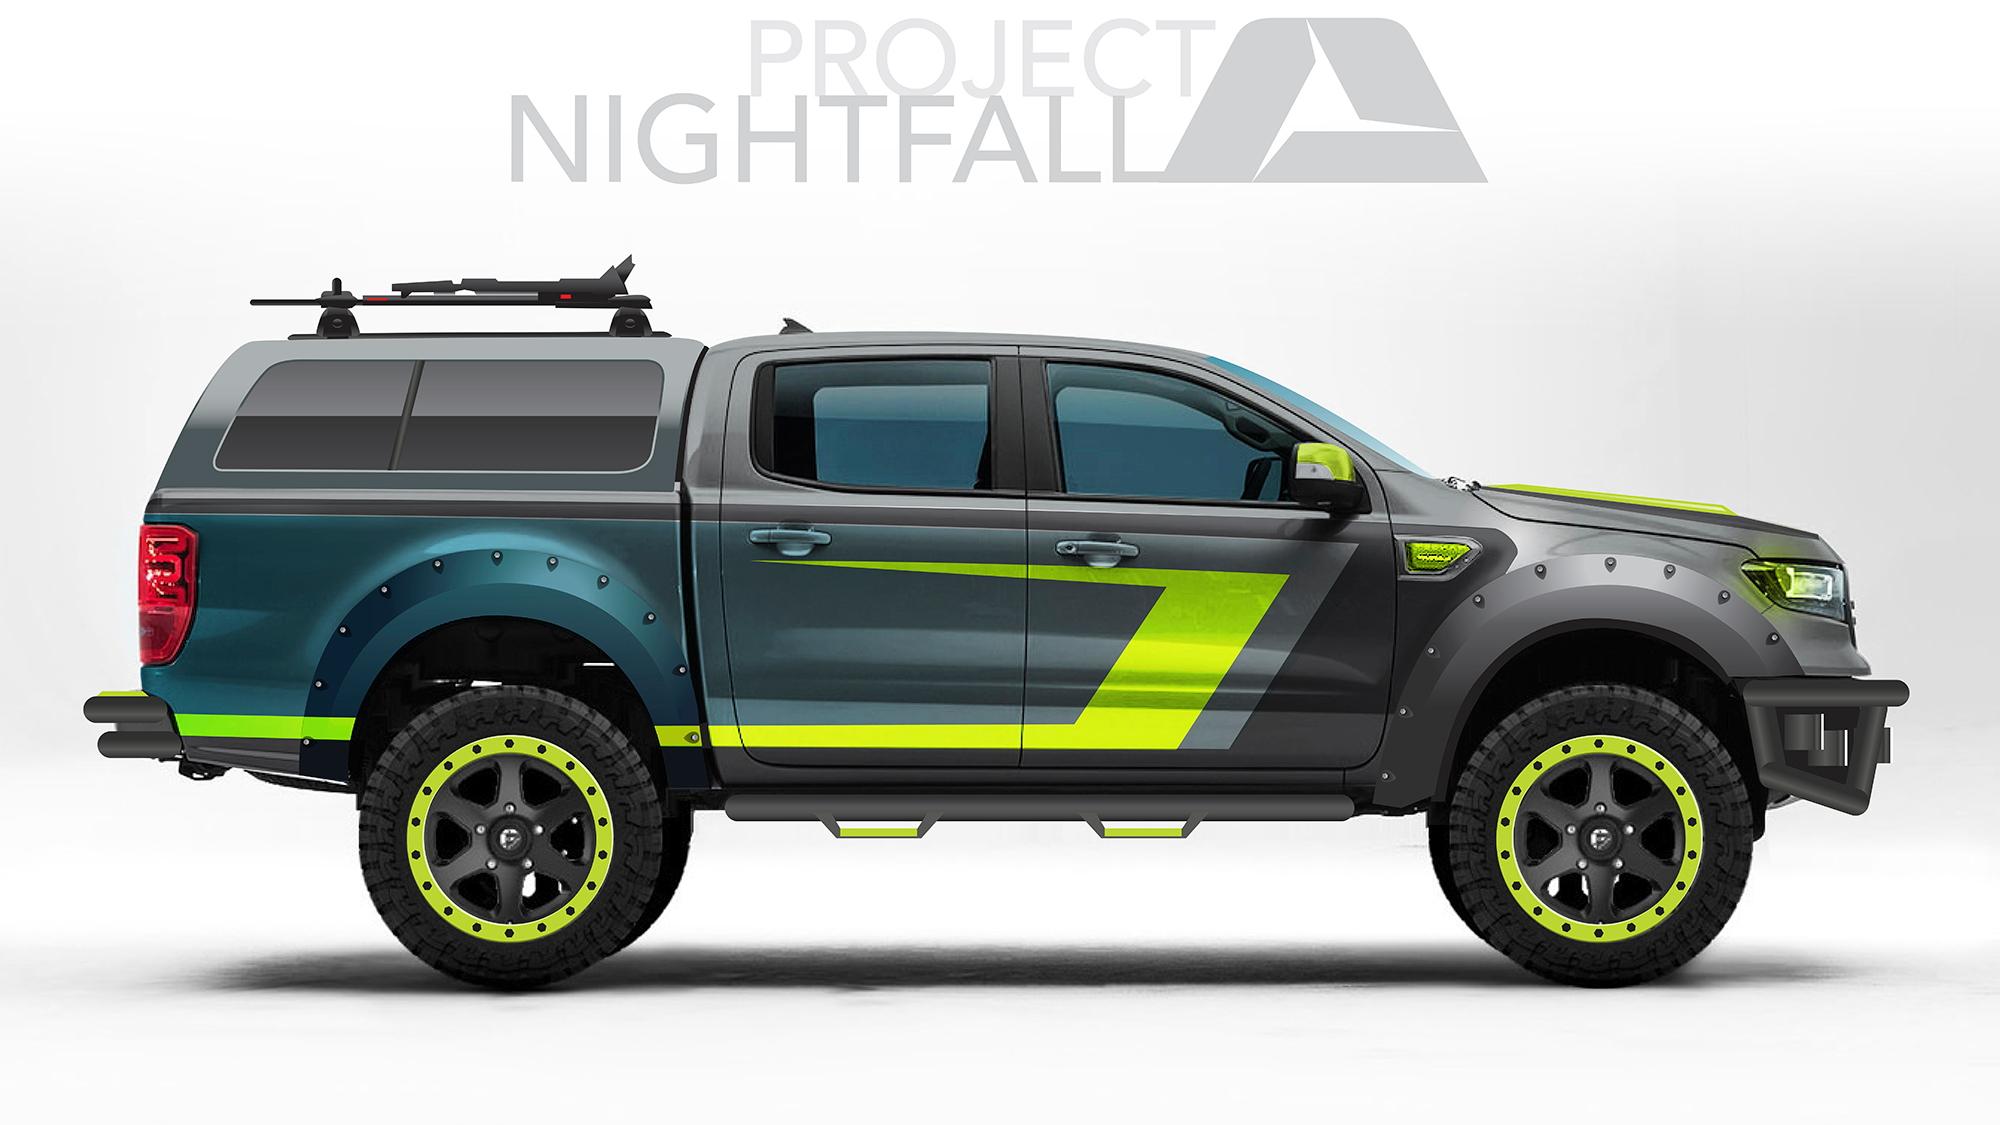 Ford Ranger SEMA Project Nightfall